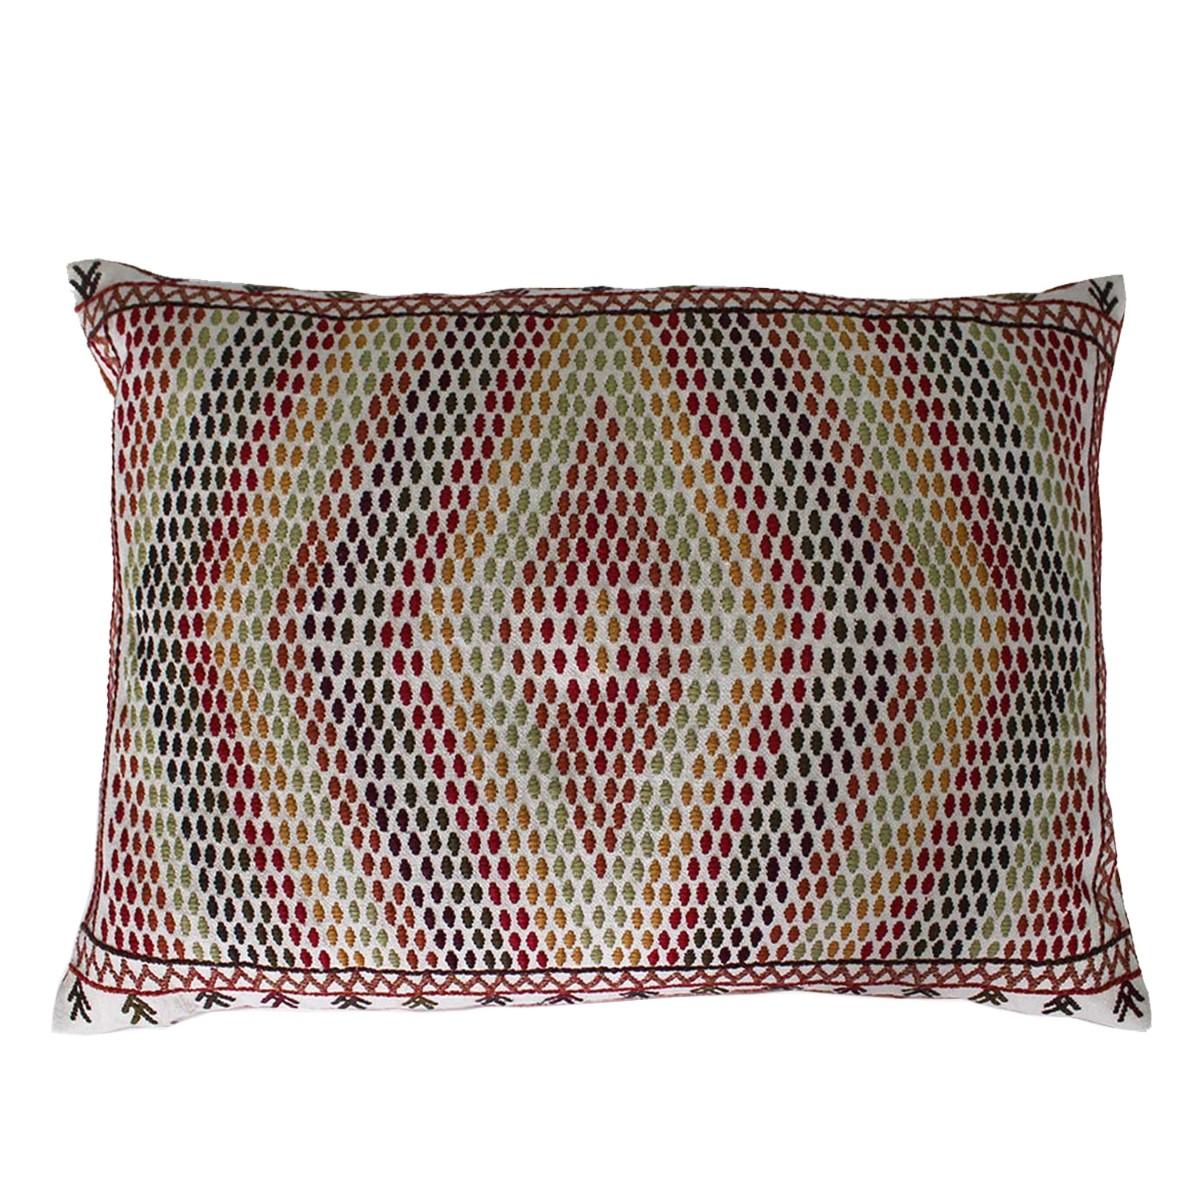 William Yeoward | Casablanca - Spice Market Cushion